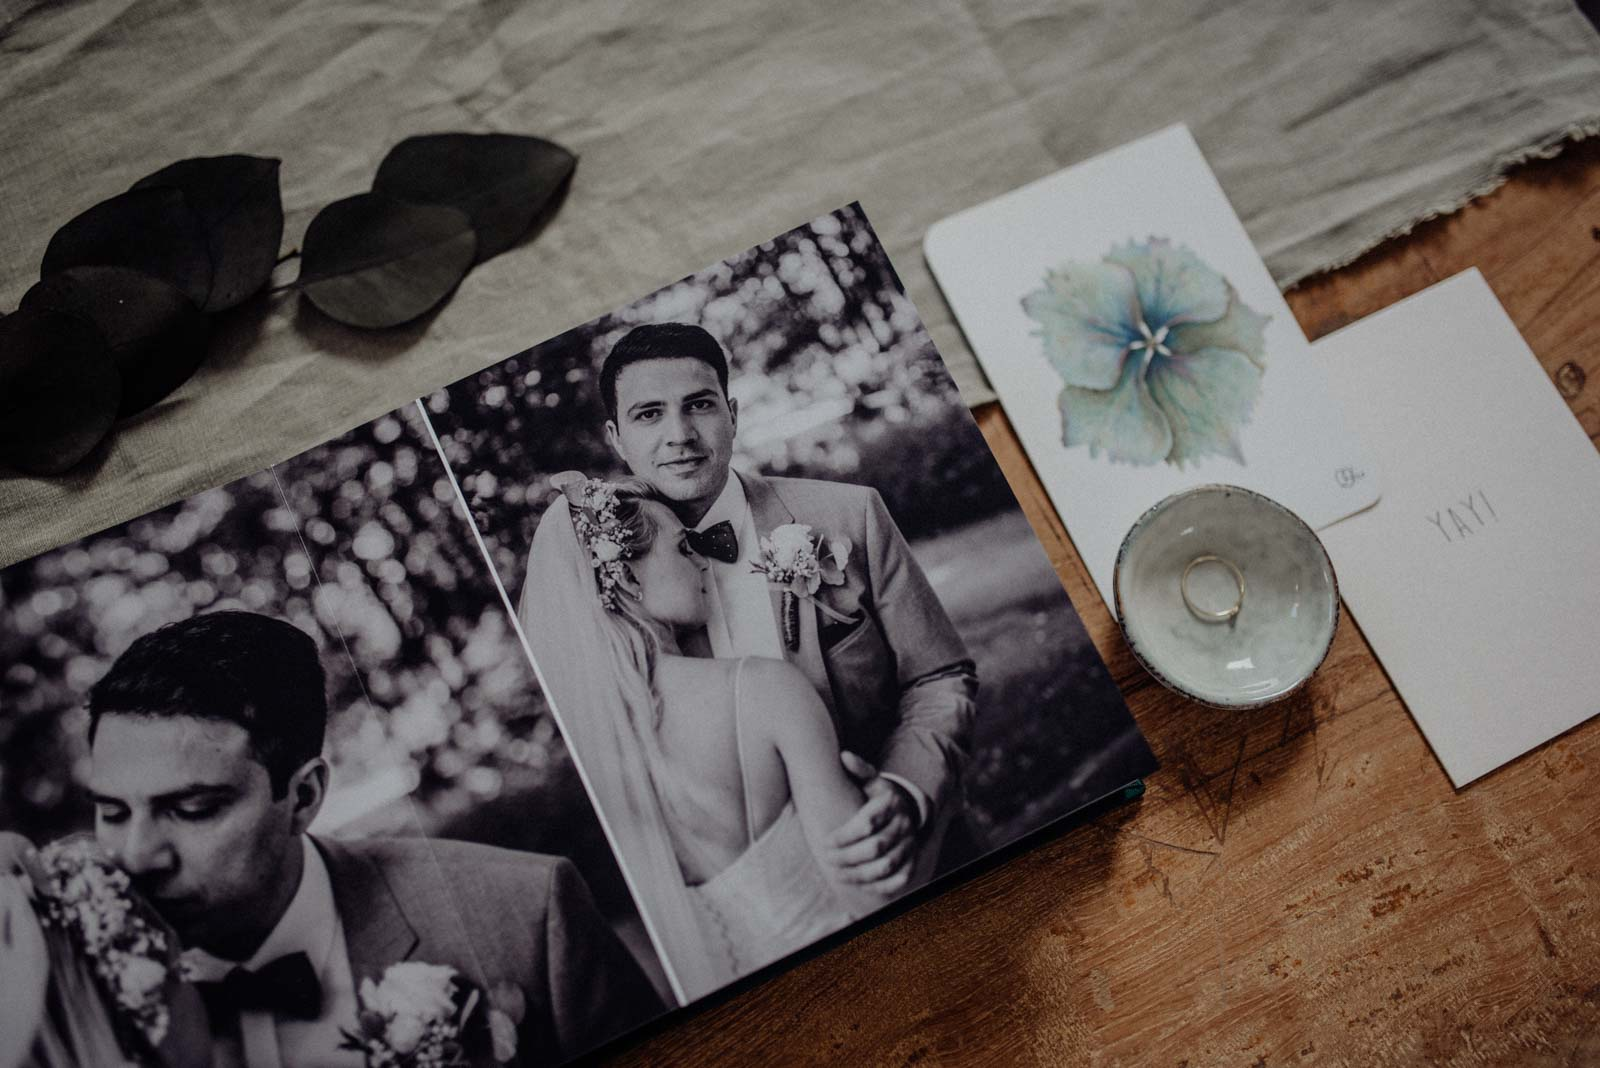 056-Fotoalbum-Fotobuch-Premium-Fotograf-Witten-Luxus